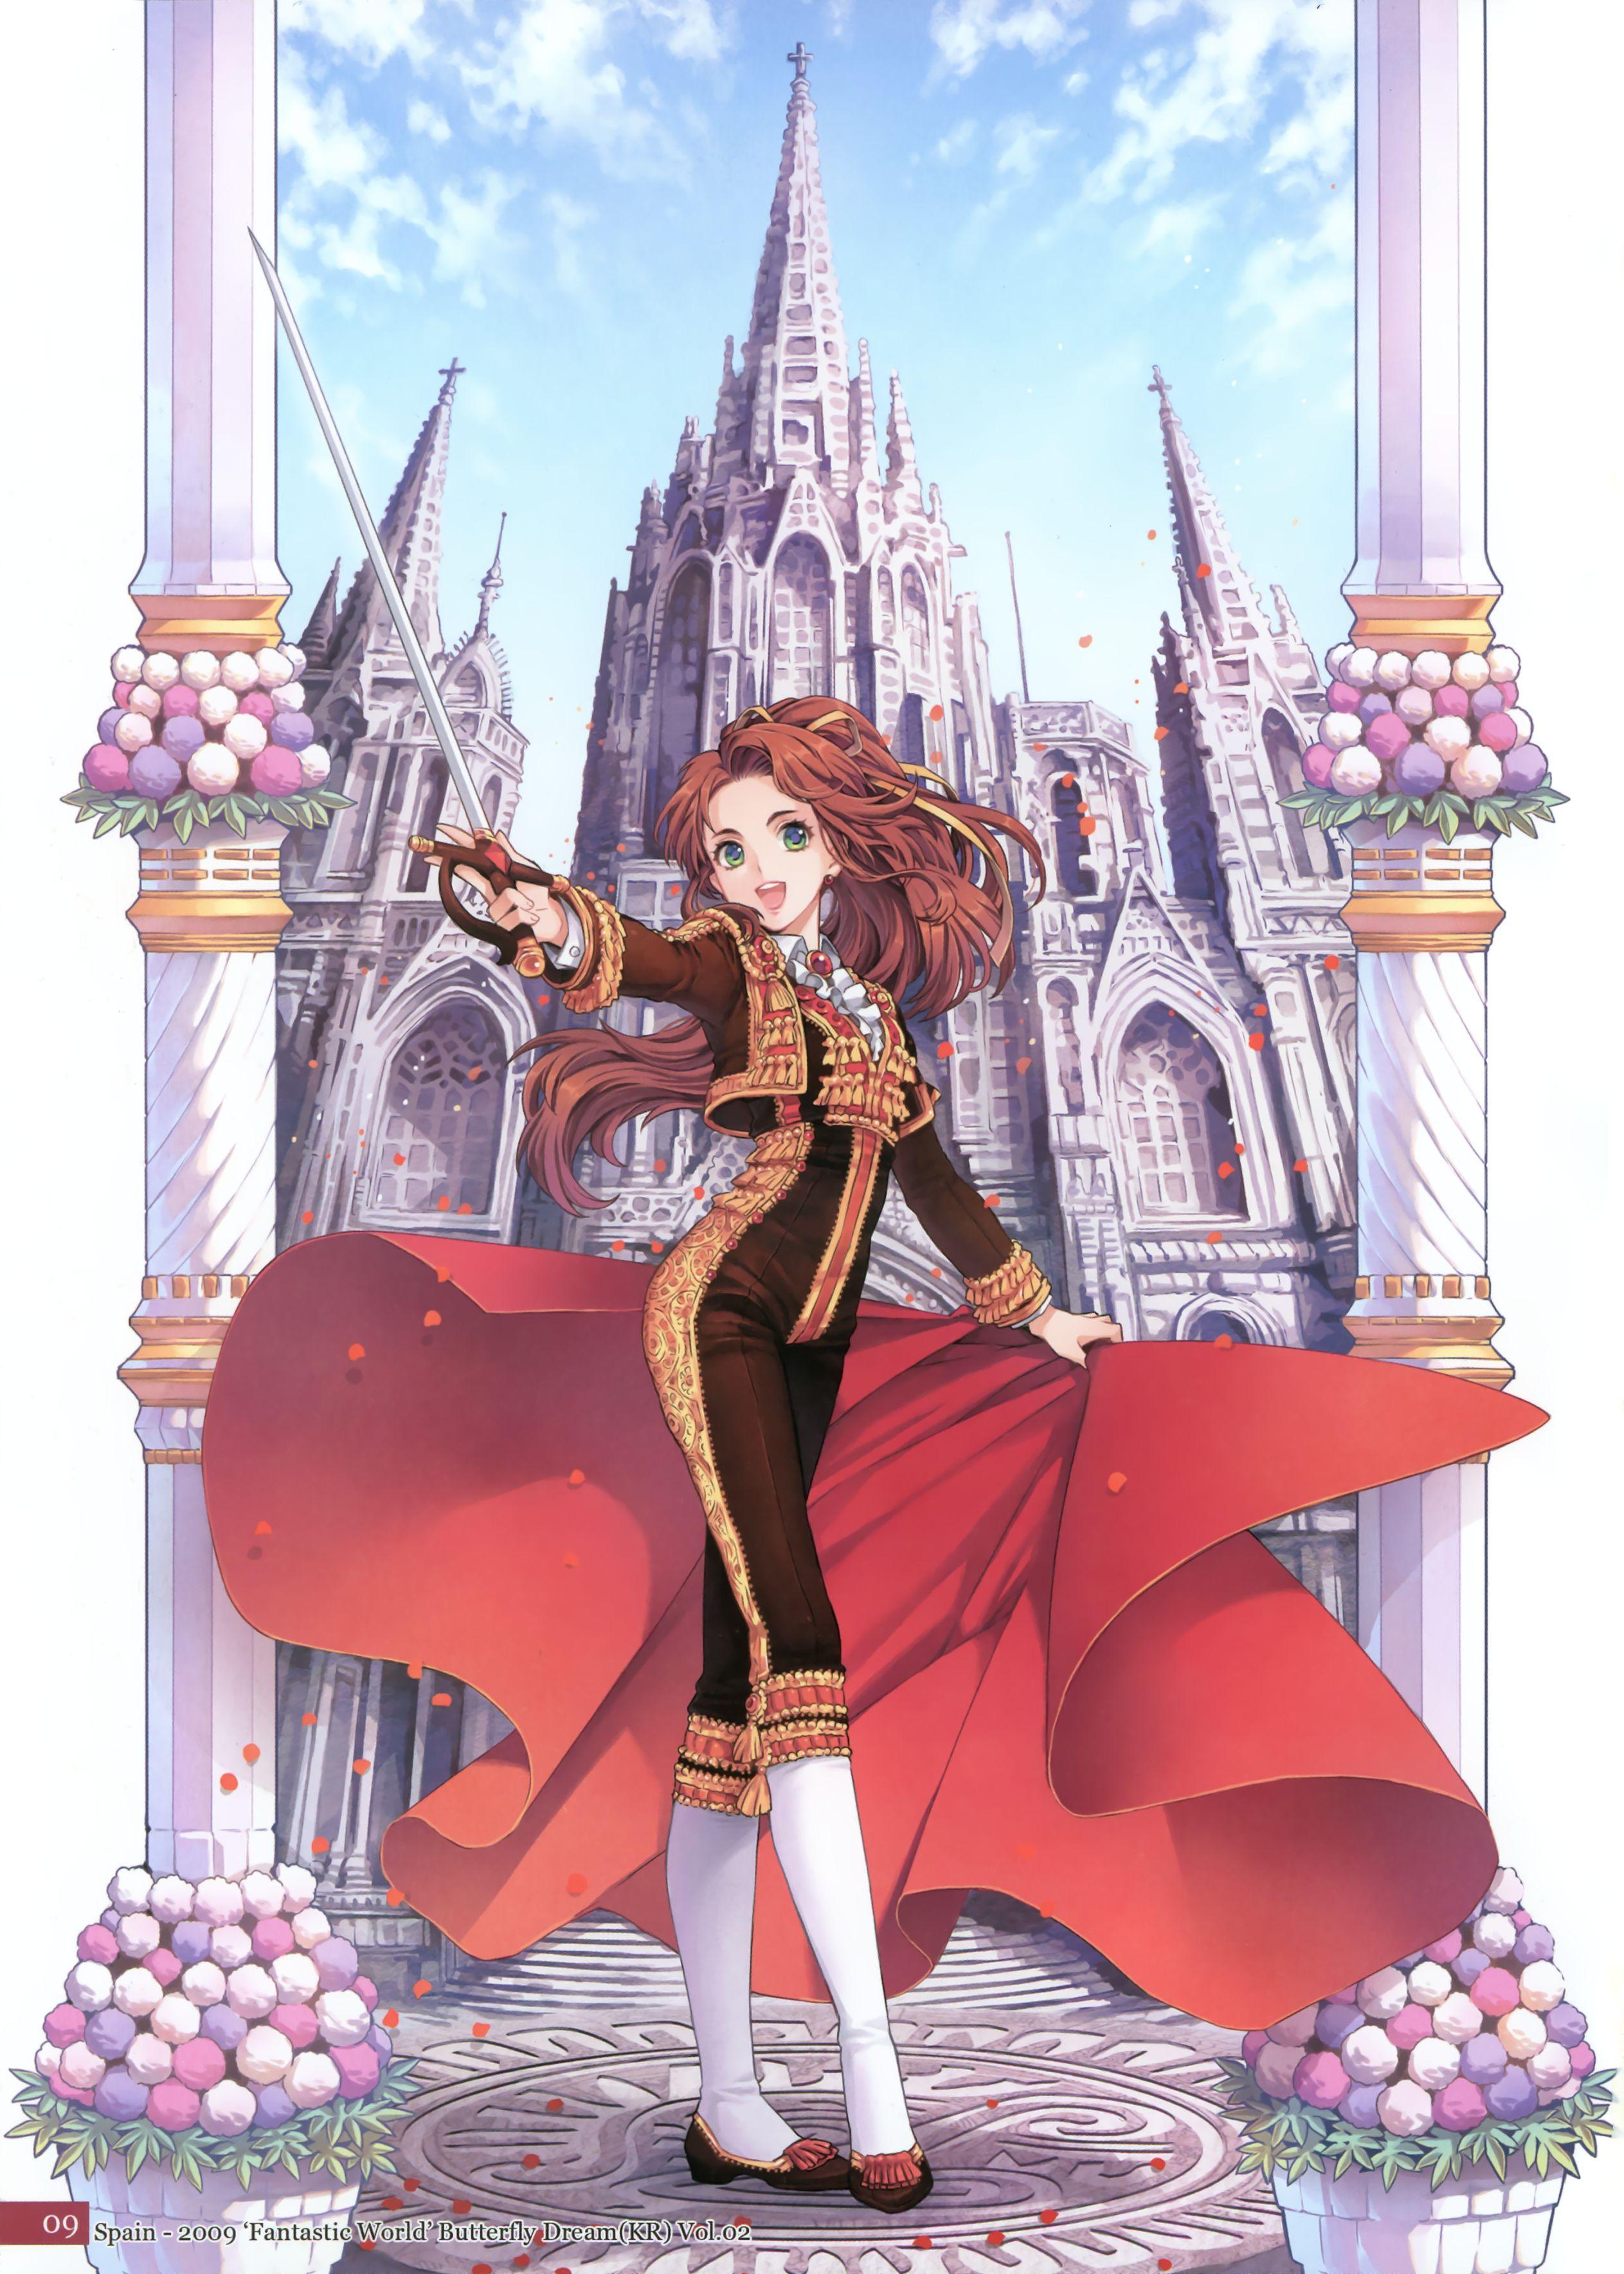 "Spain ""Fantastic World"" Butterfly Dream vol.02, 2009"